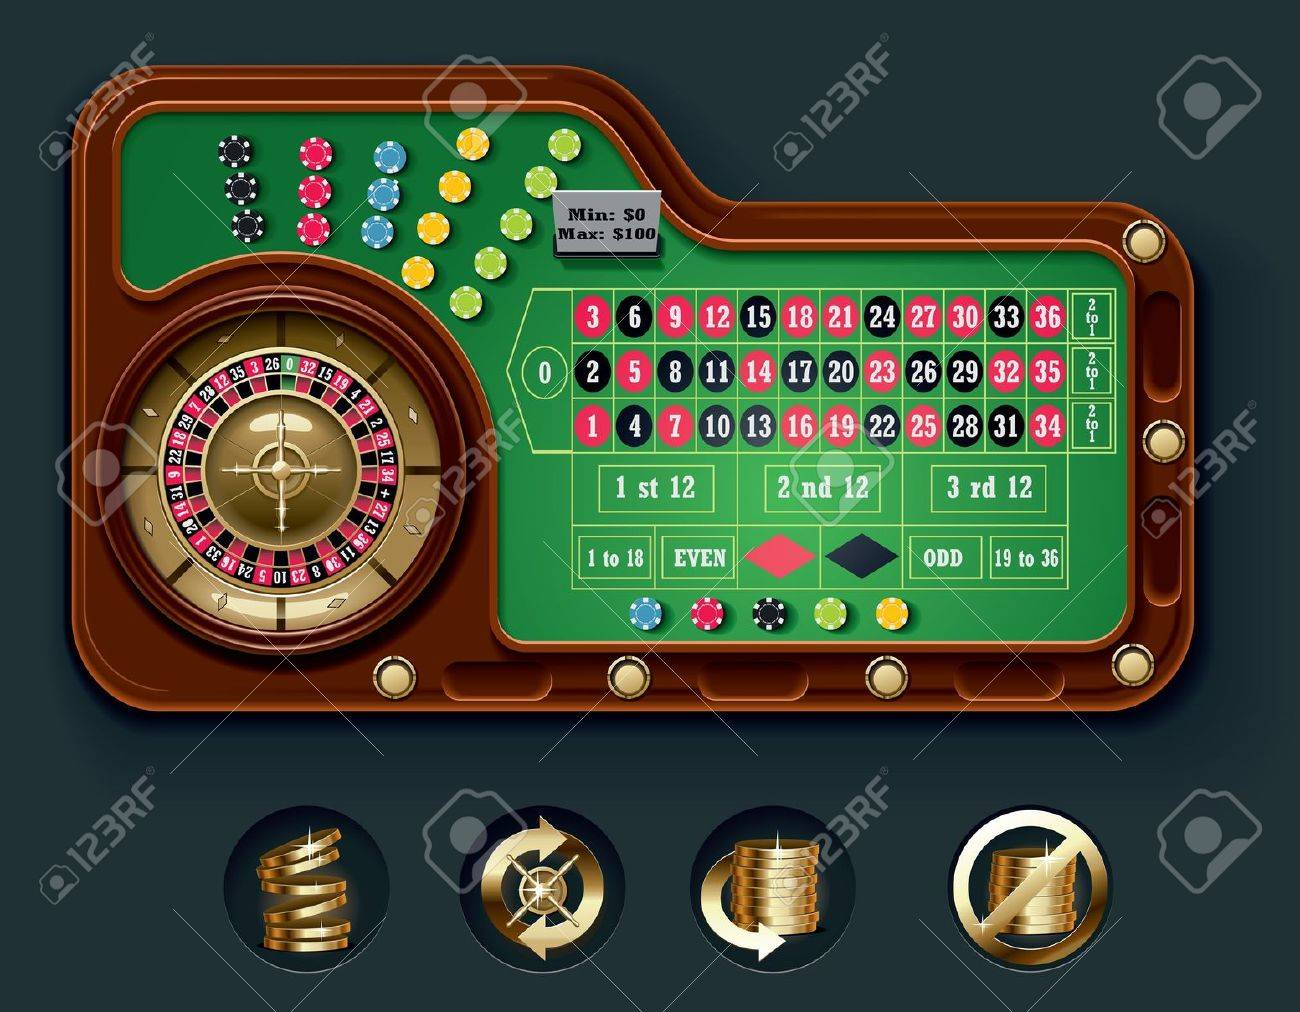 European roulette table layout - 7345887